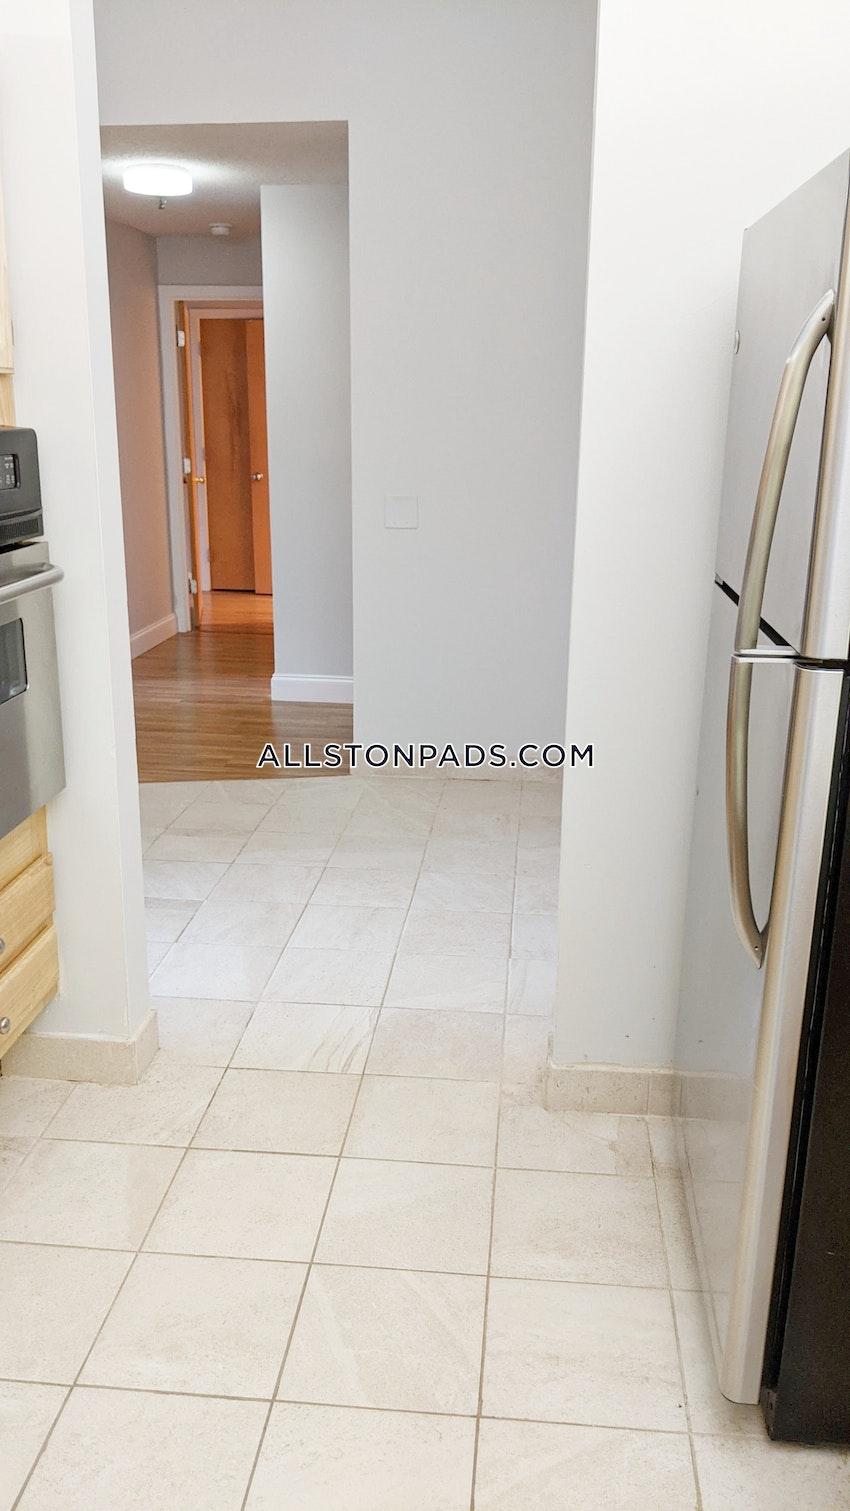 BOSTON - ALLSTON - 2 Beds, 2 Baths - Image 6